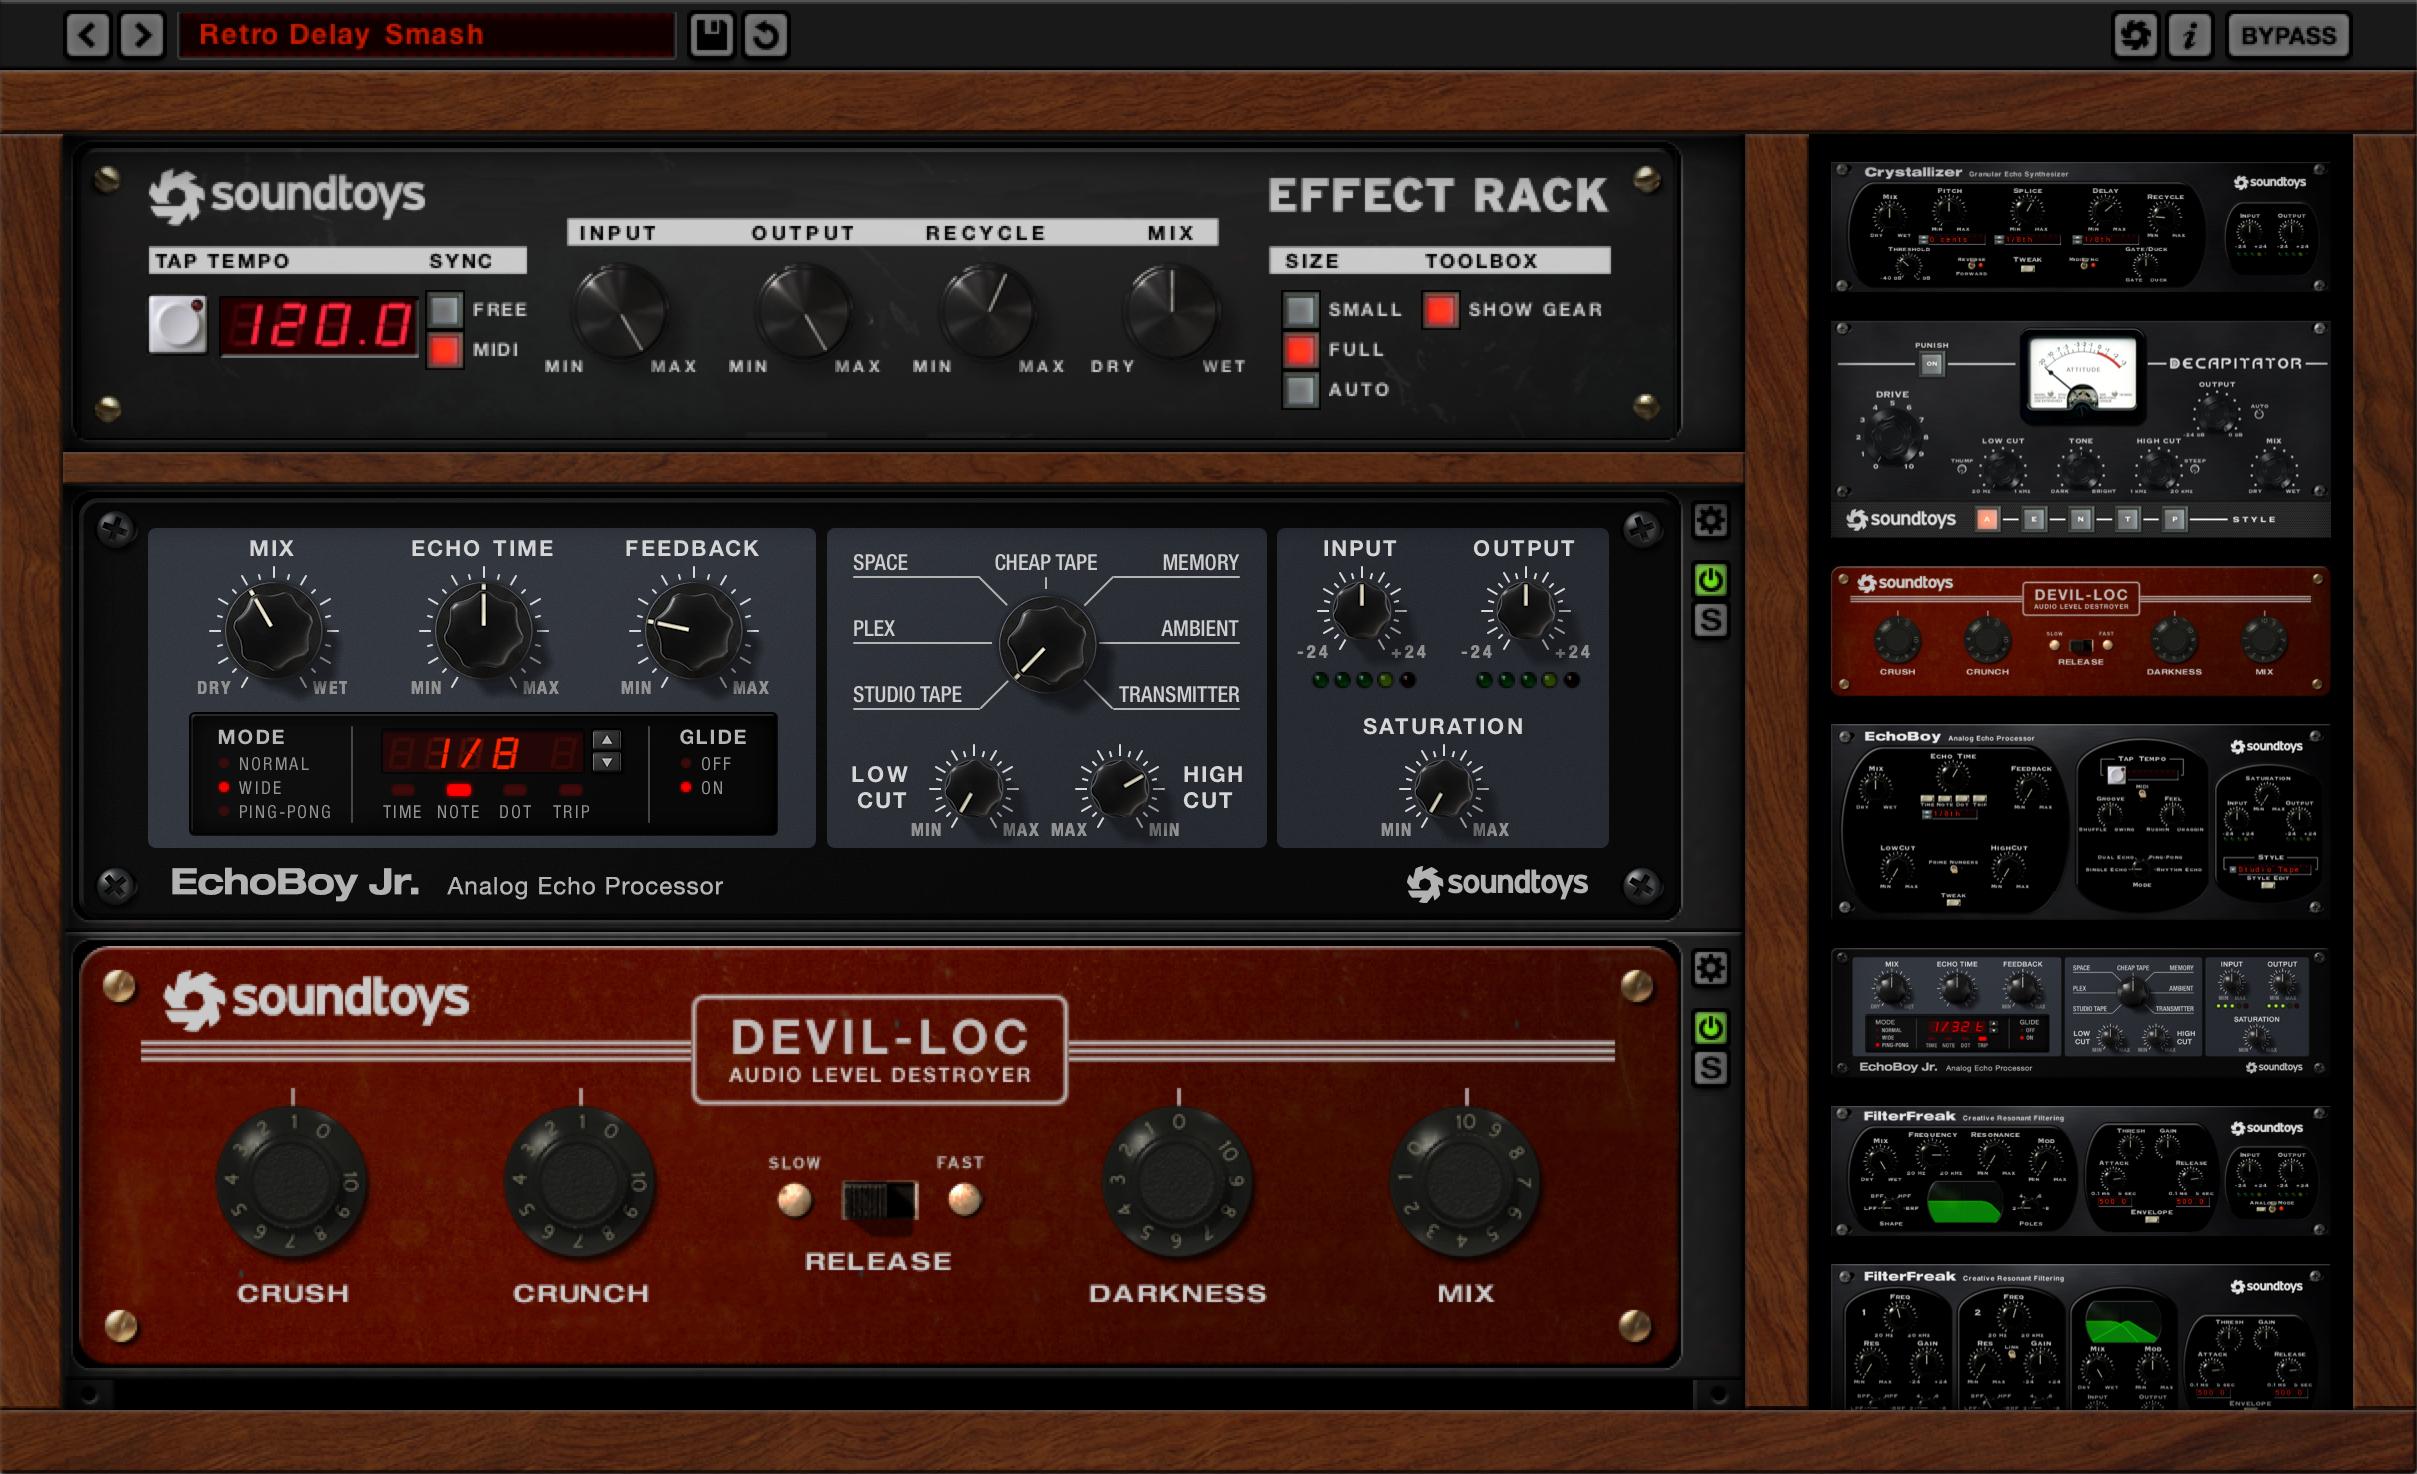 Soundtoys Effect Rack free plugin